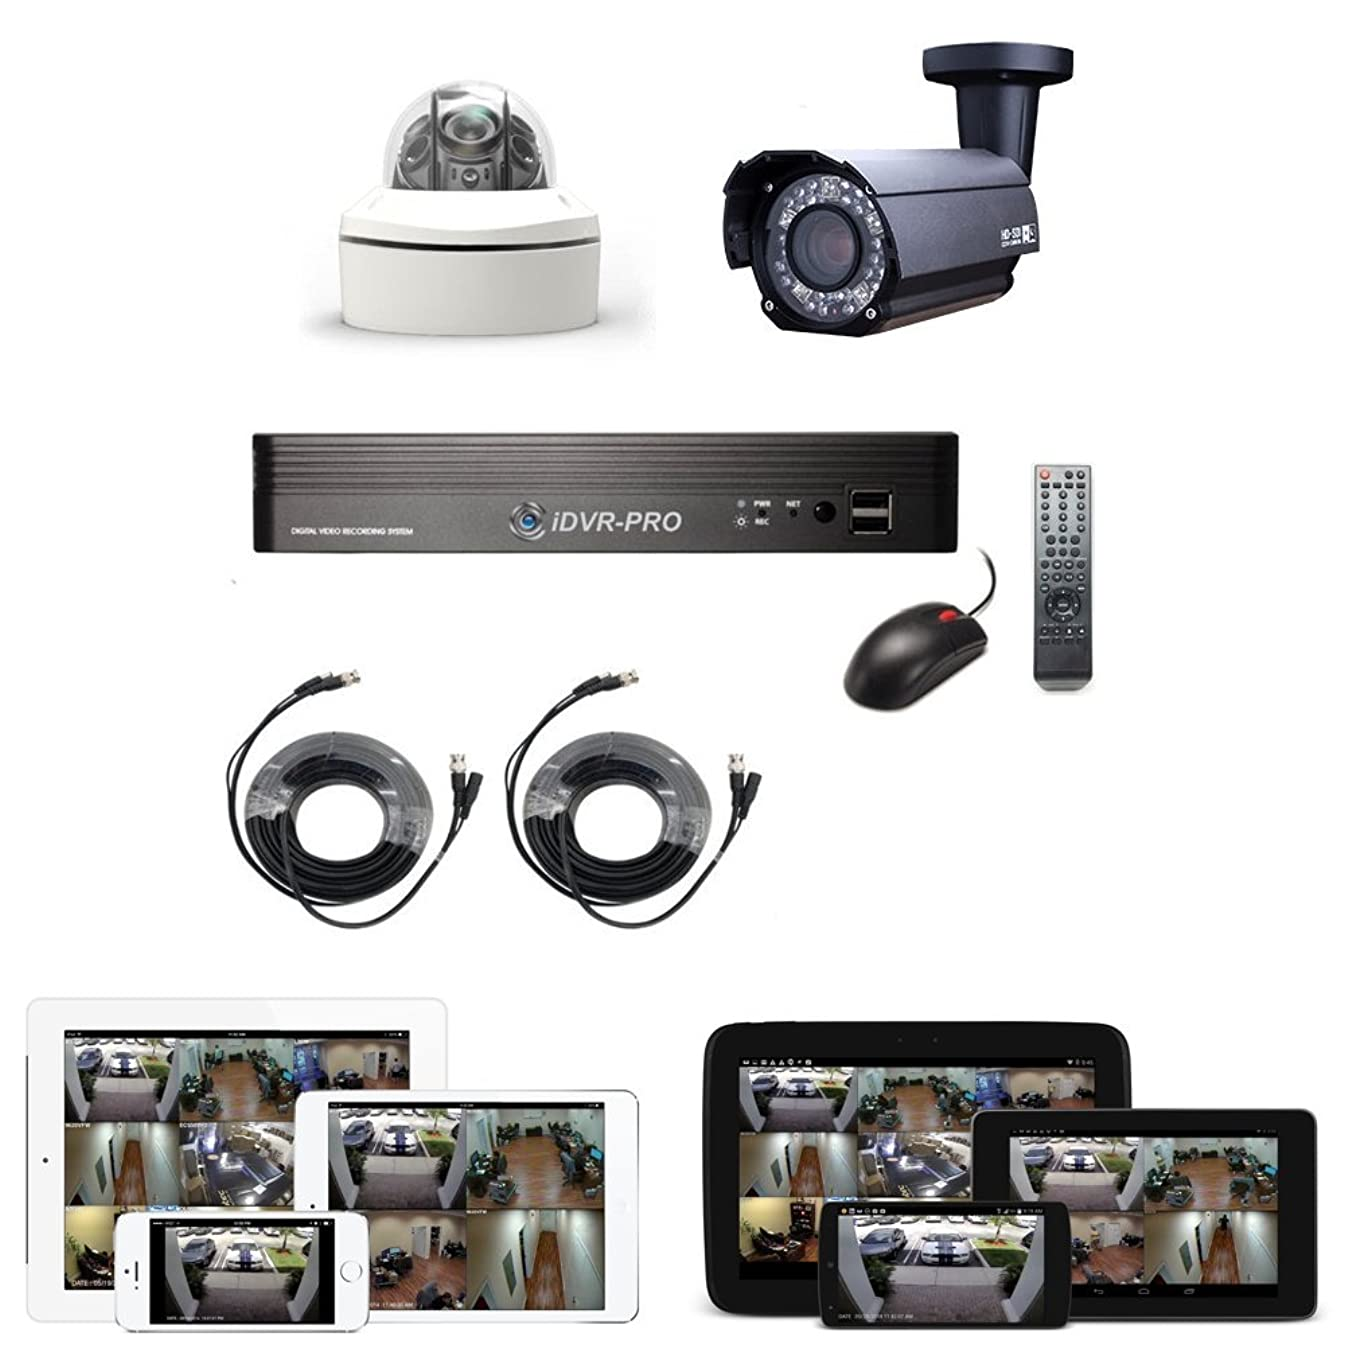 CCTV Camera Pros LPR-HD2X License Plate Capture Camera System, 1080p HD LPR Camera, HD CCTV DVR